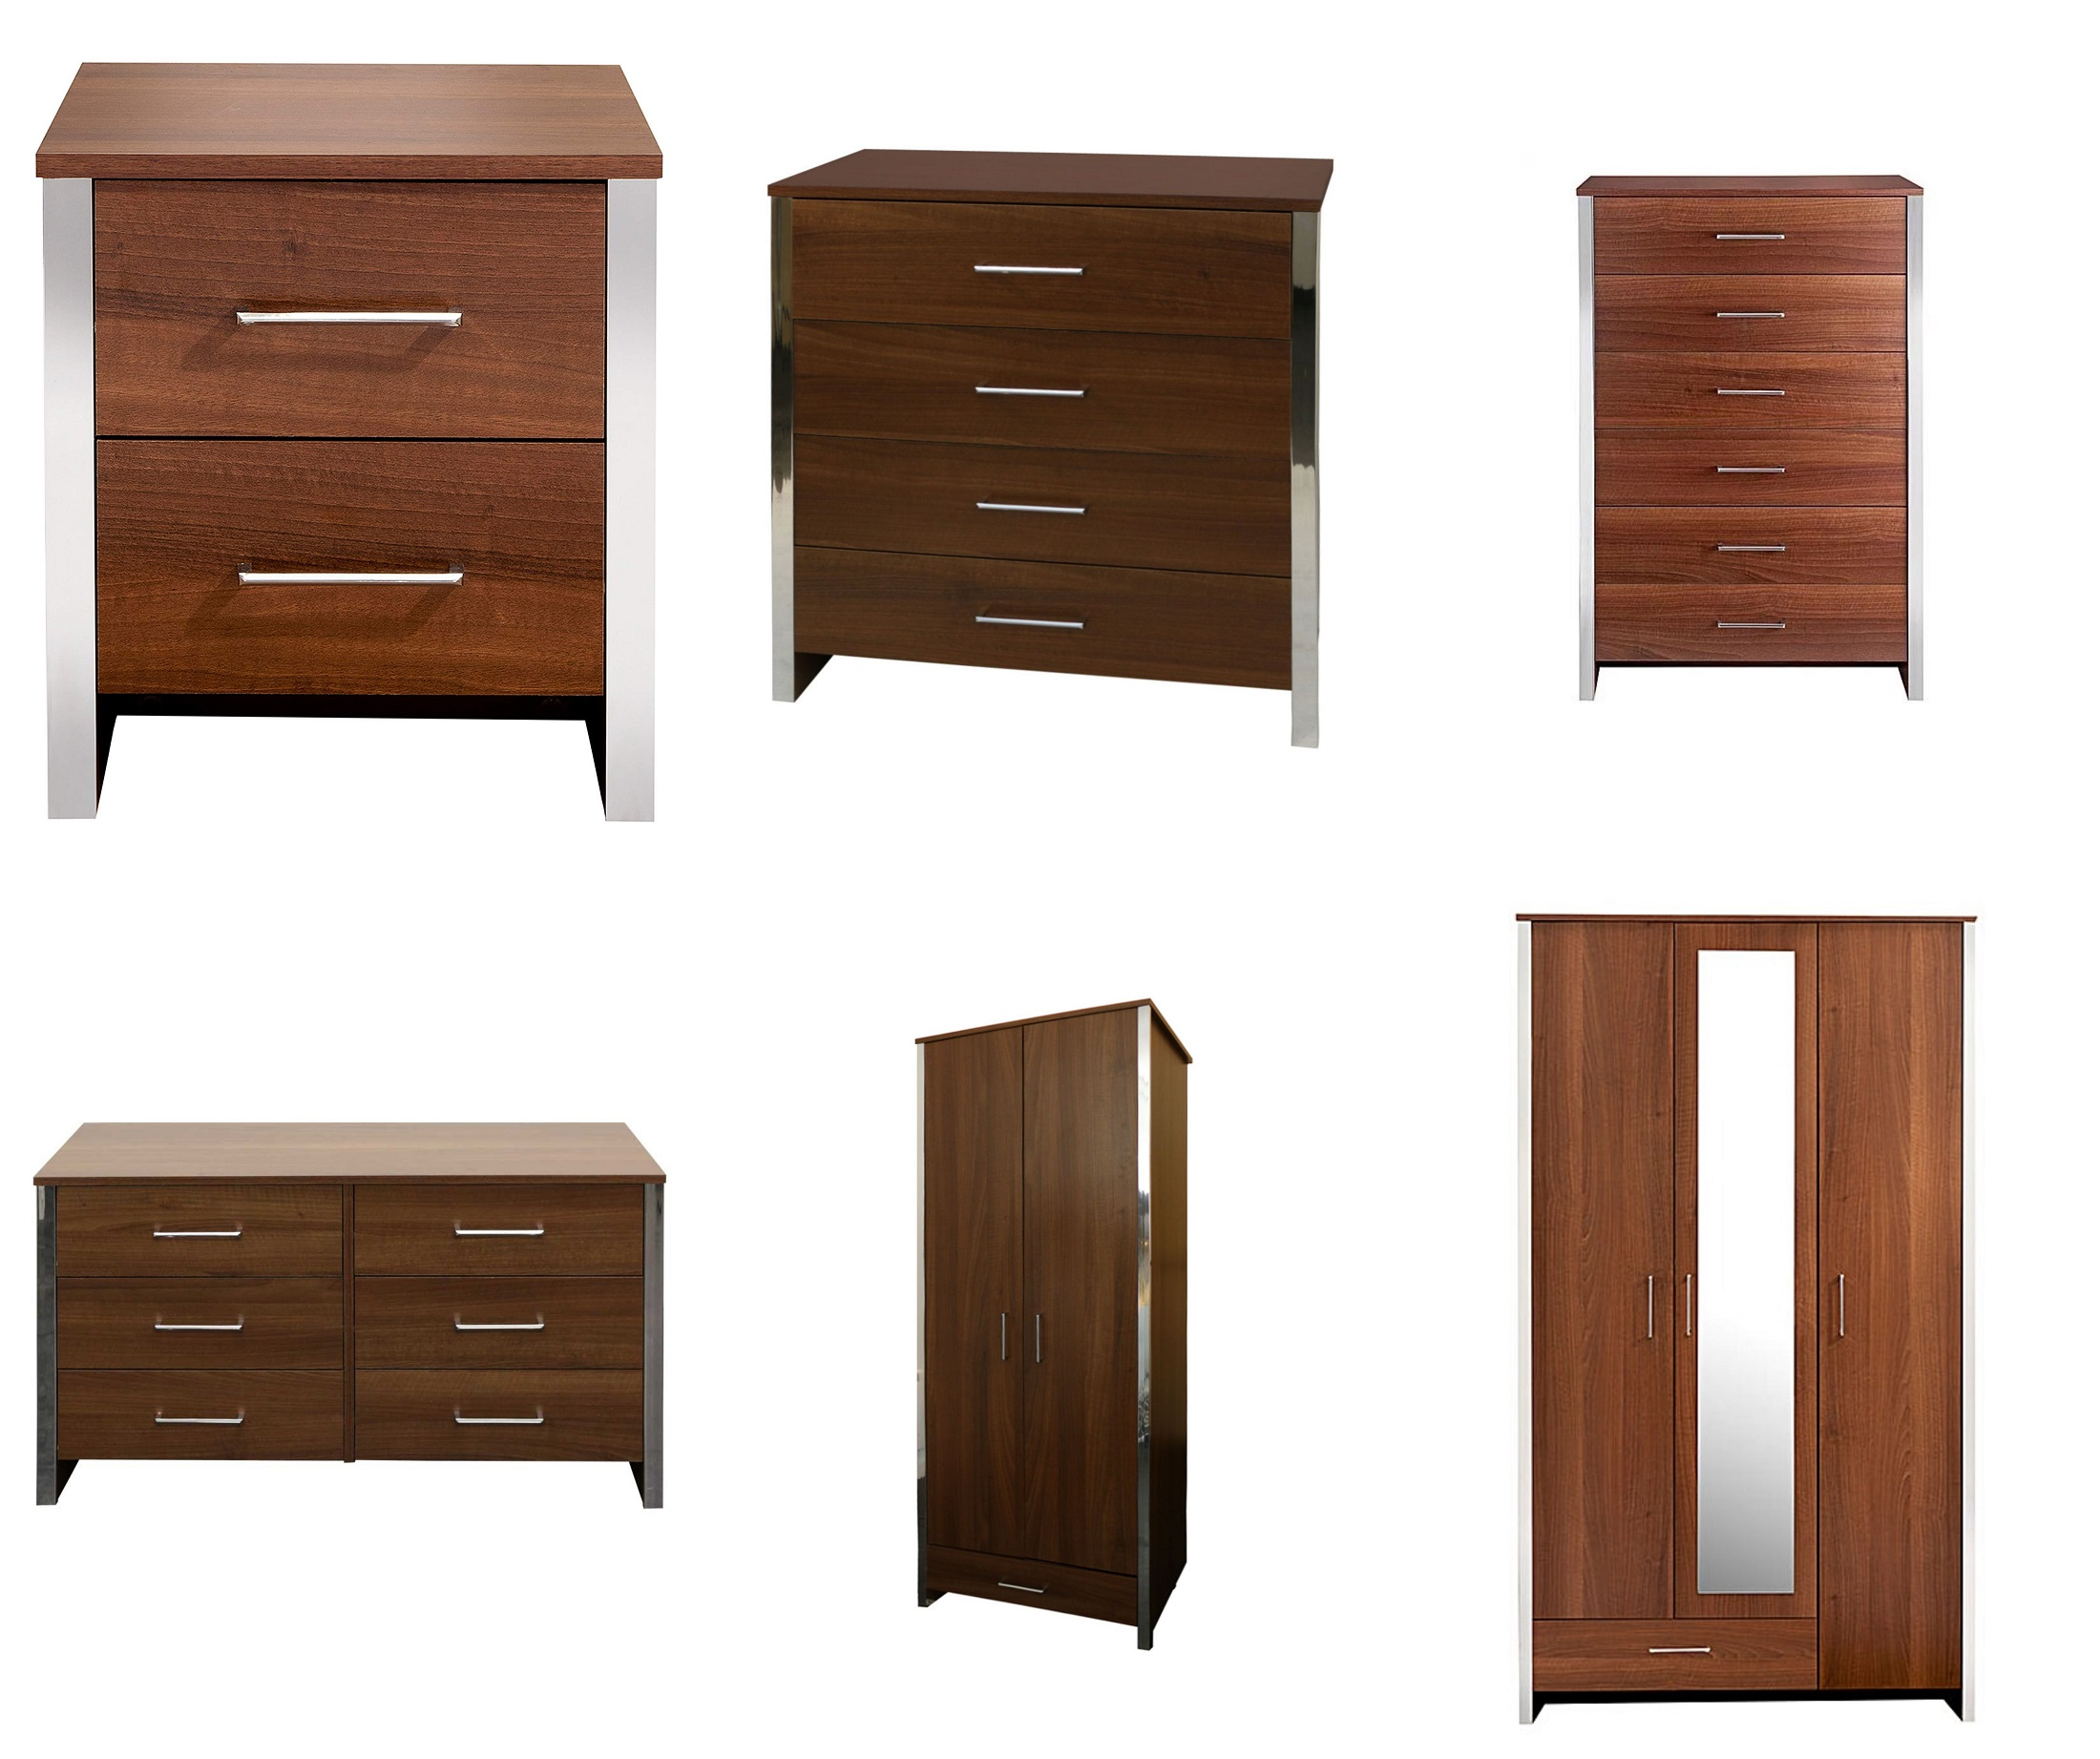 Gosport Walnut Bedroom Furniture Chests Of Drawers